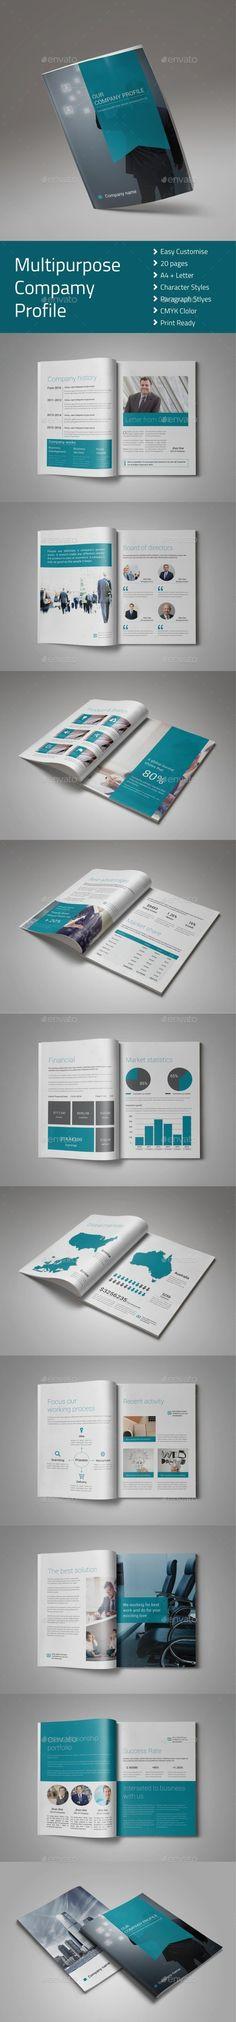 Creative Agency Square Portfolio Brochure Template Indesign Indd